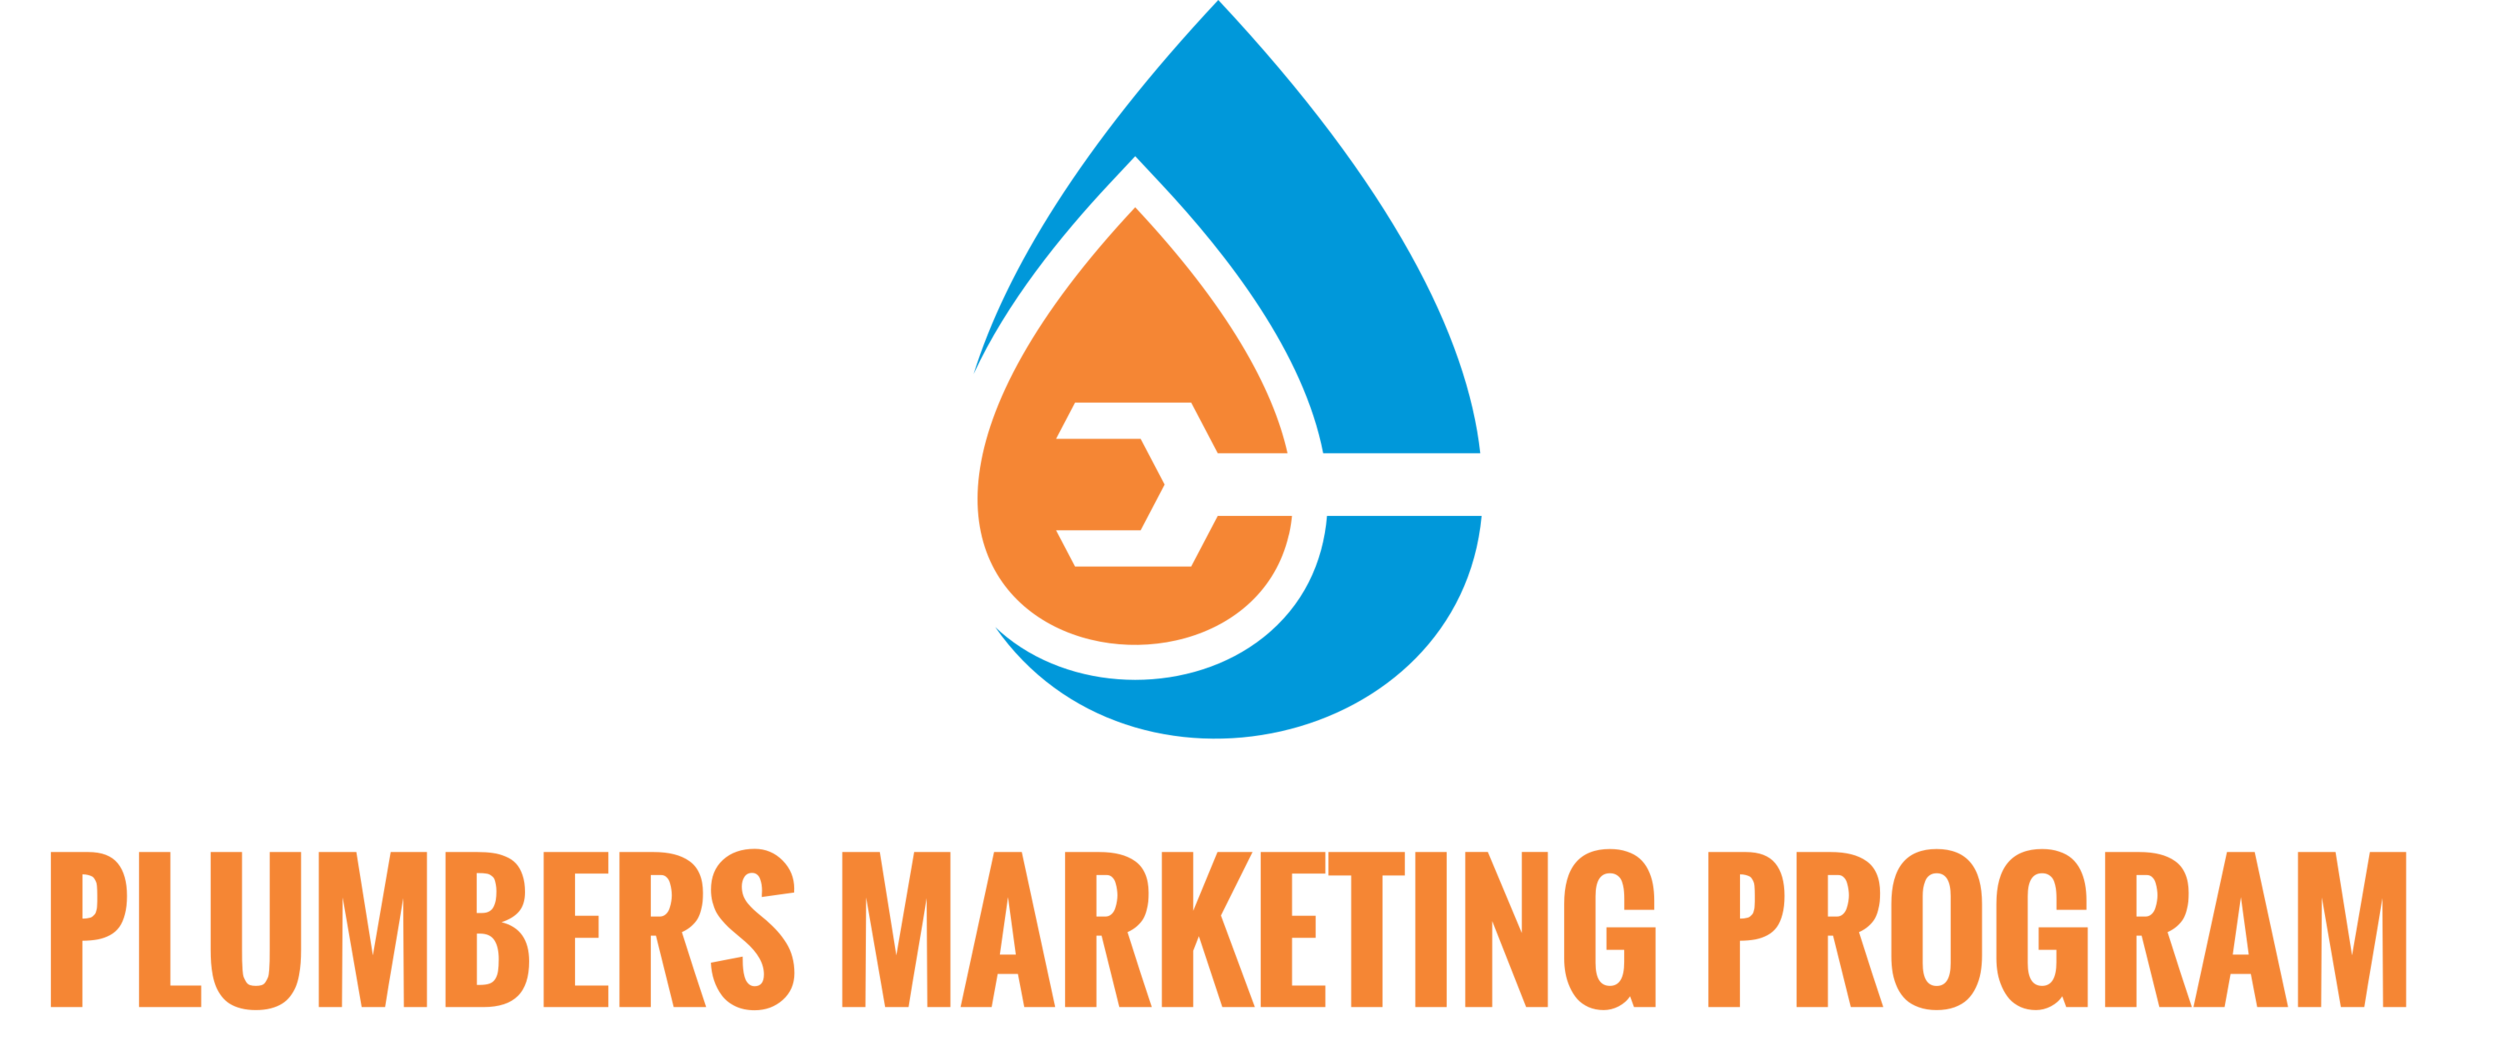 Plumbers Marketing Program